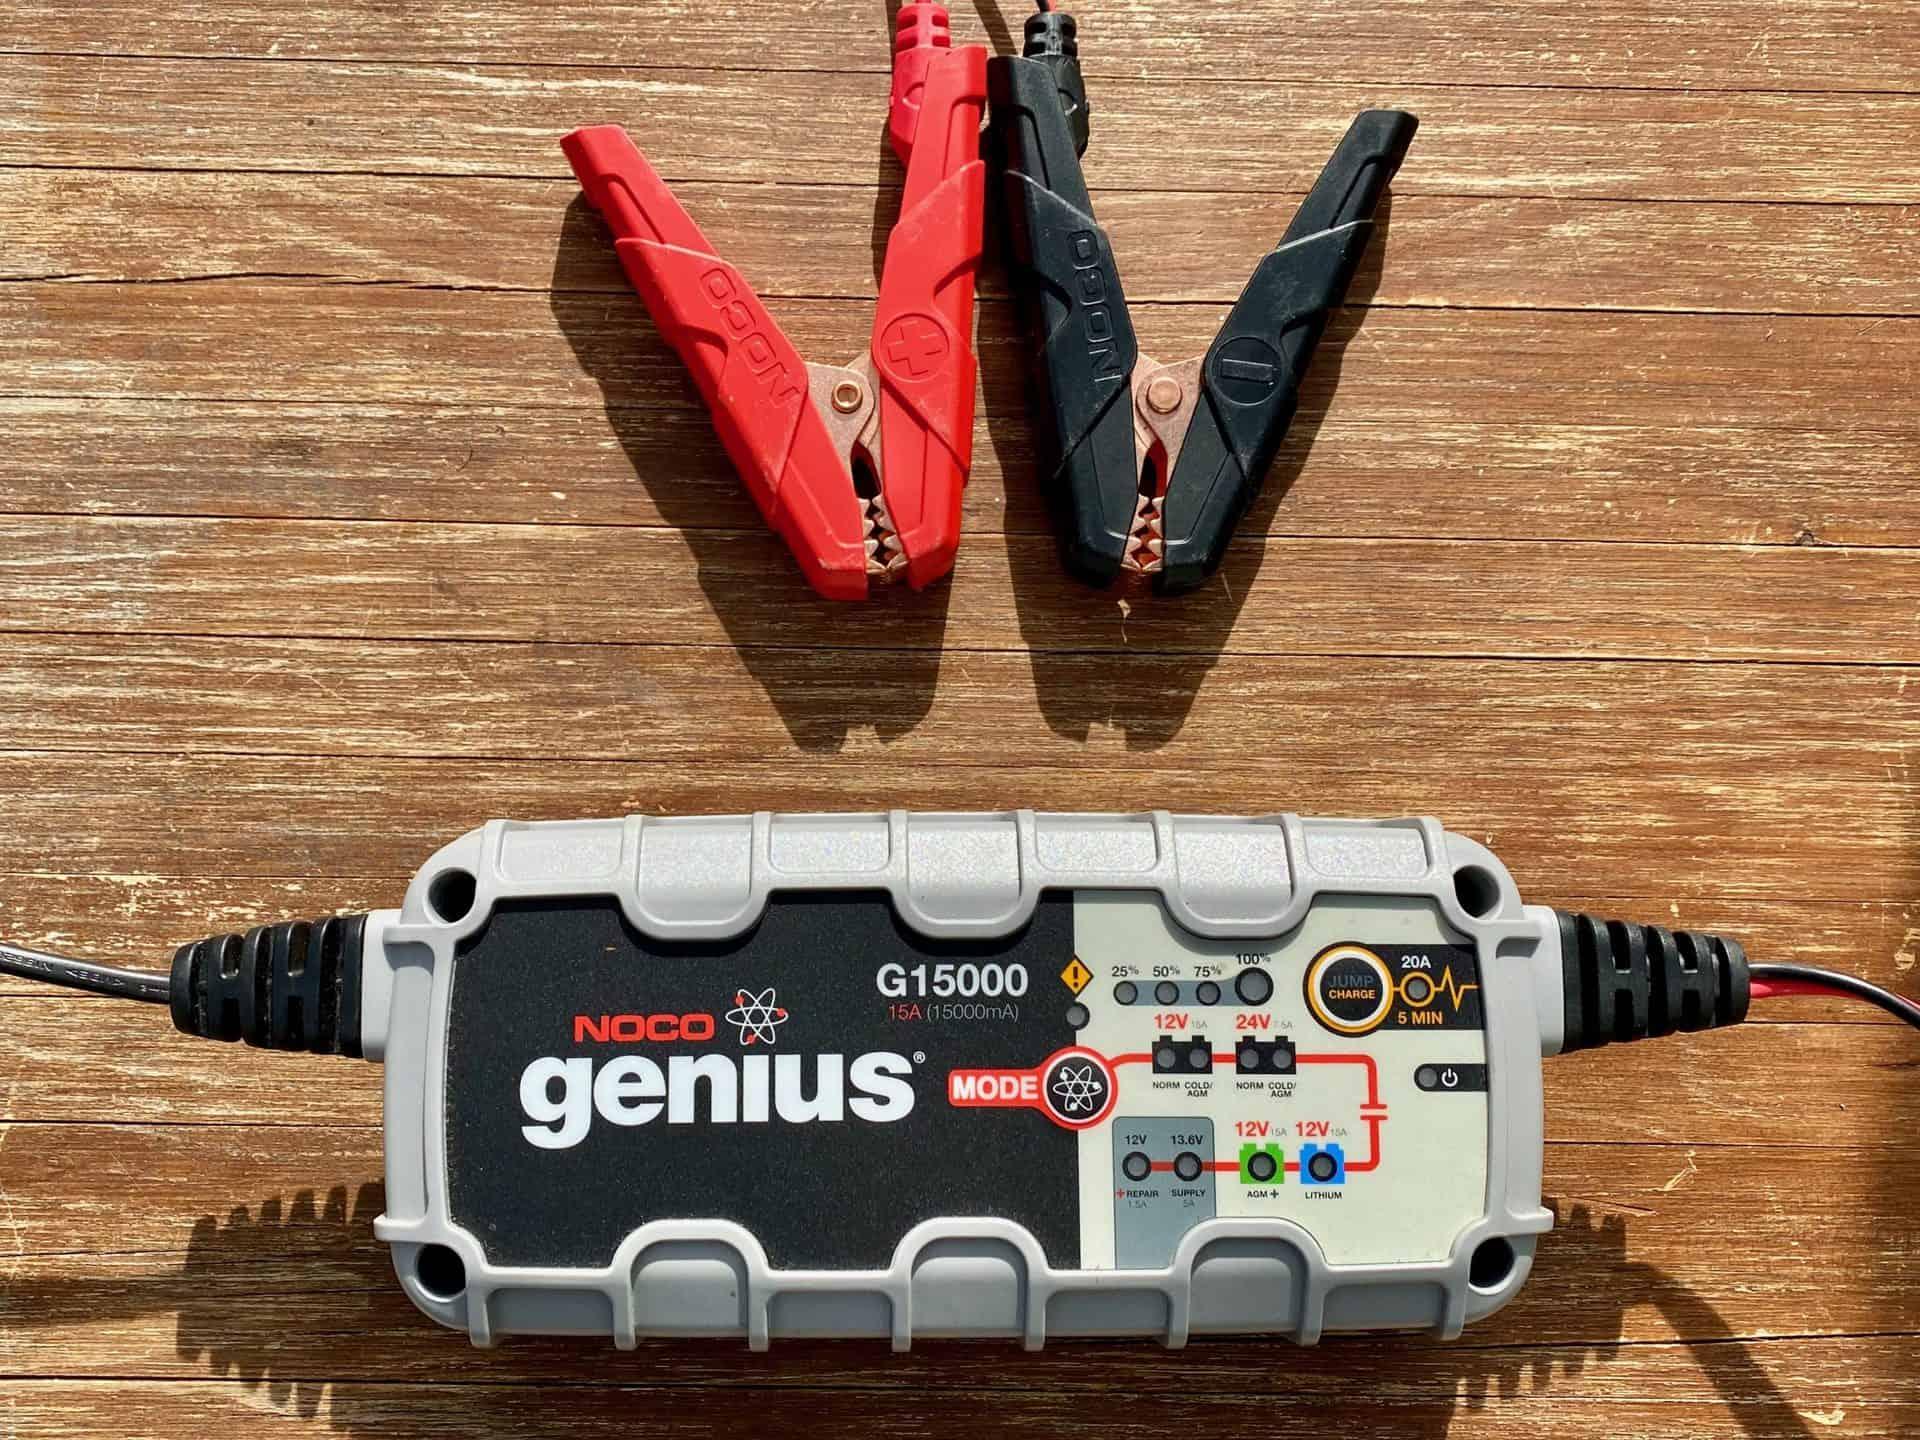 Noco-Genius-G15000